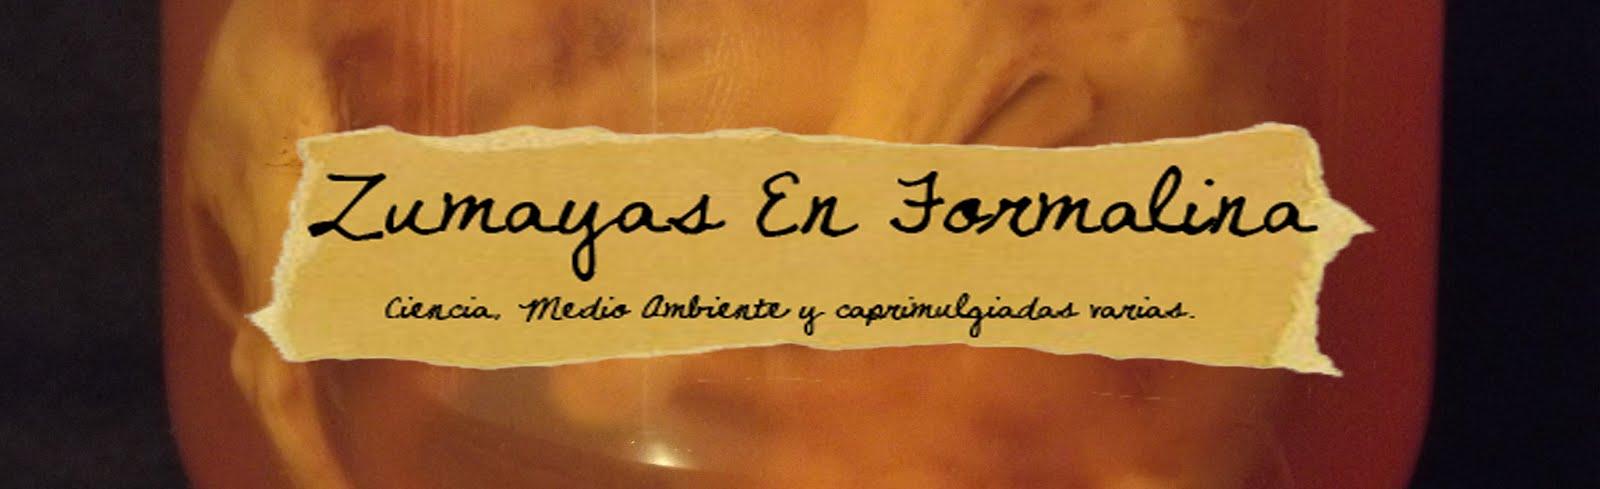 ZUMAYAS EN FORMALINA